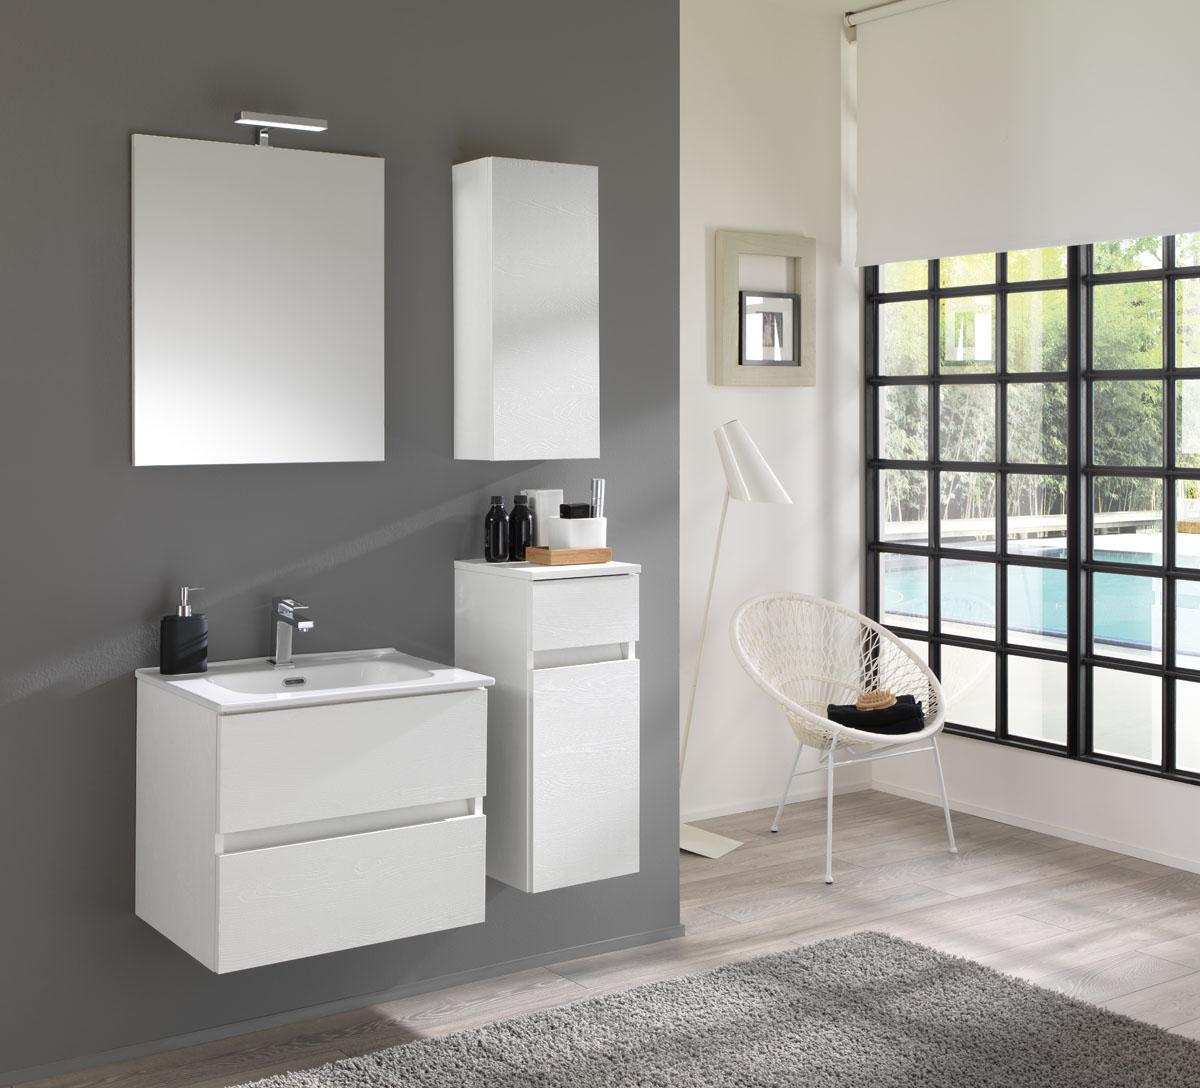 Picture of: Kora 09 Washbasin Unit B M Supplies Ltd